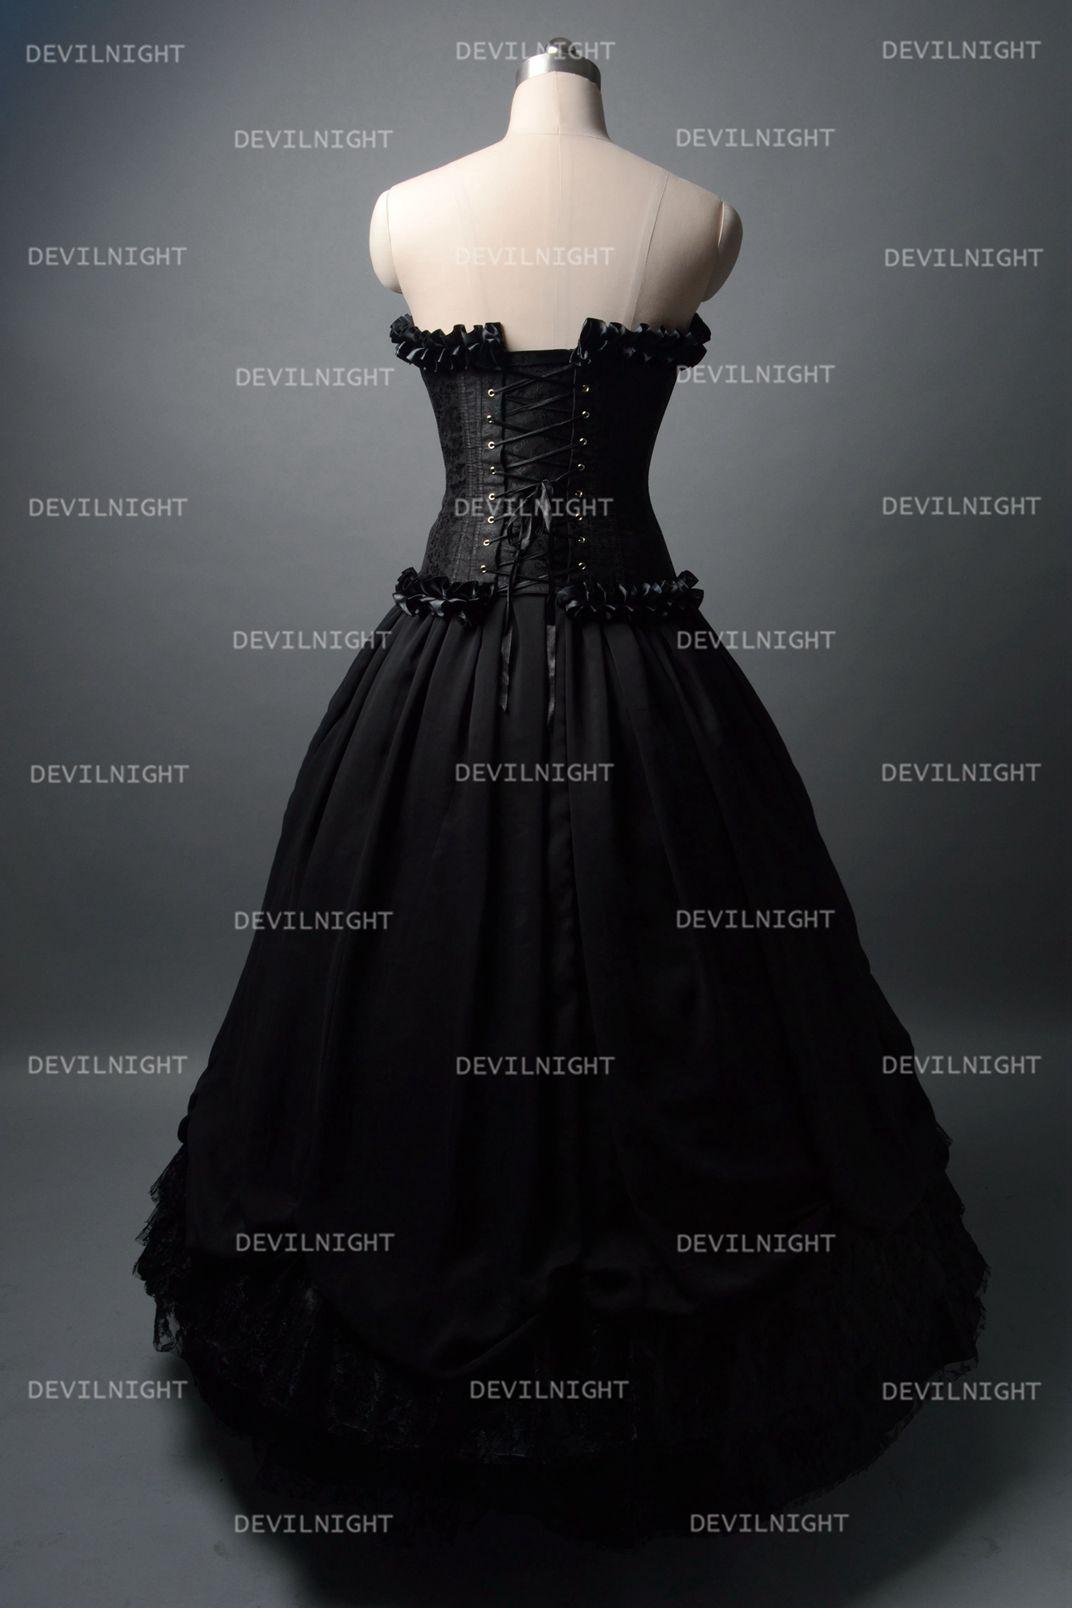 roamtic_black_gothic_corset_long_prom_party_dress_dresses_4.jpg